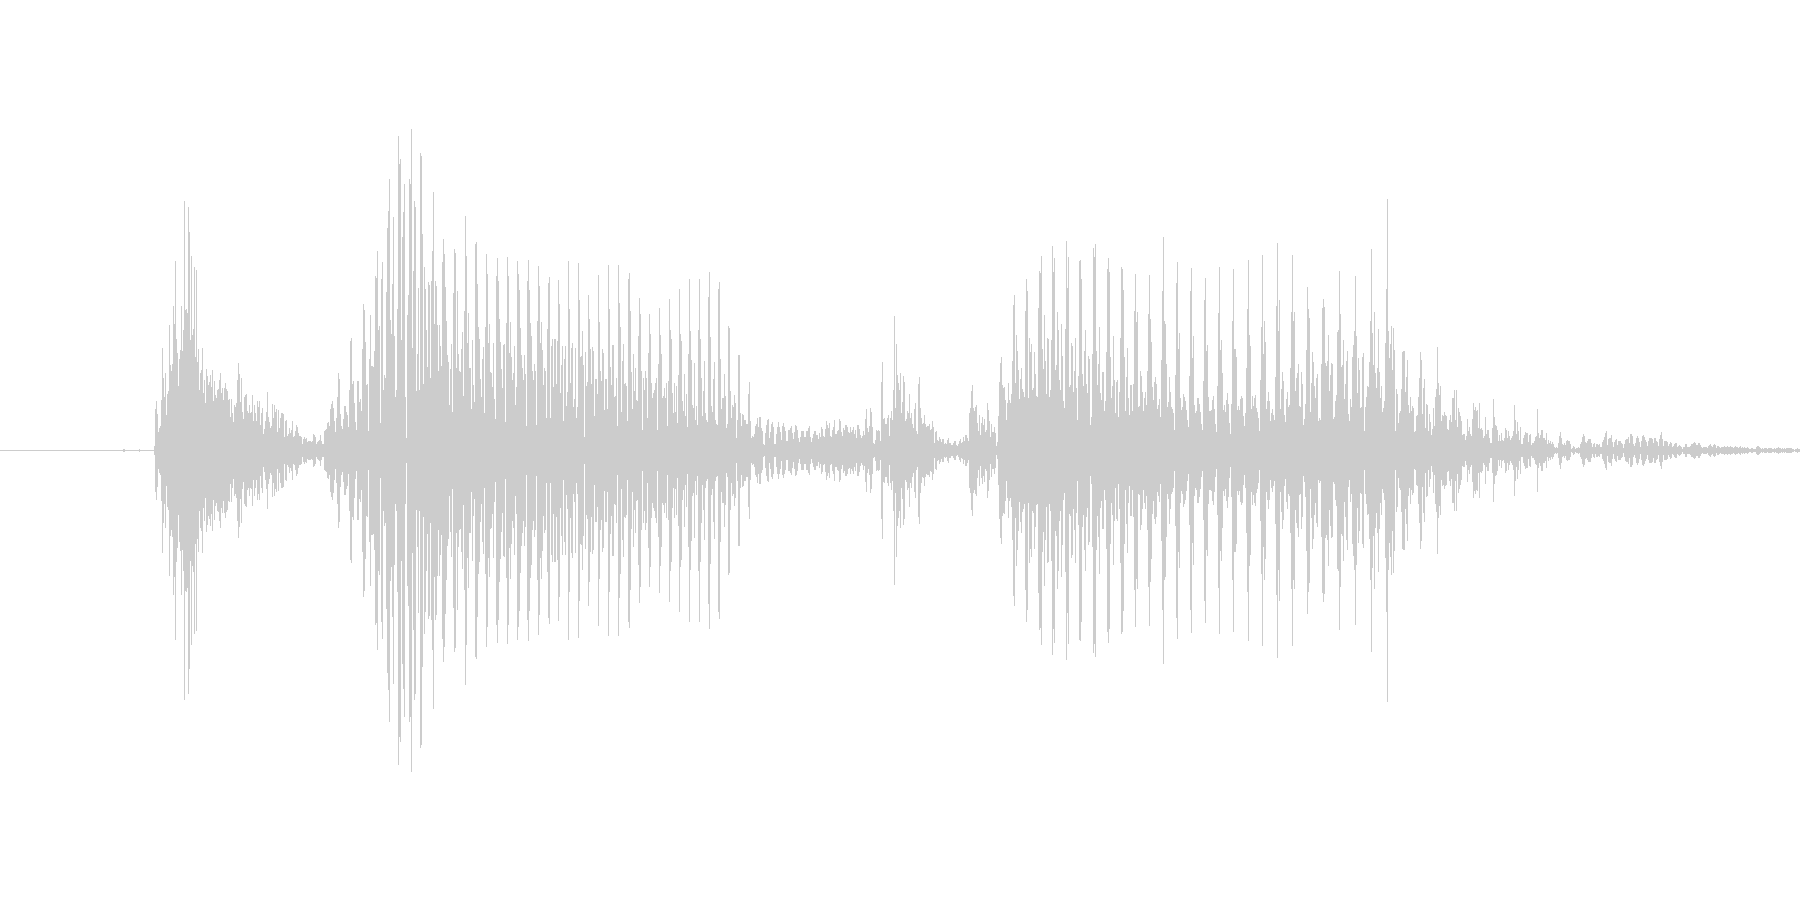 「12 AM」英語発音の未再生の波形